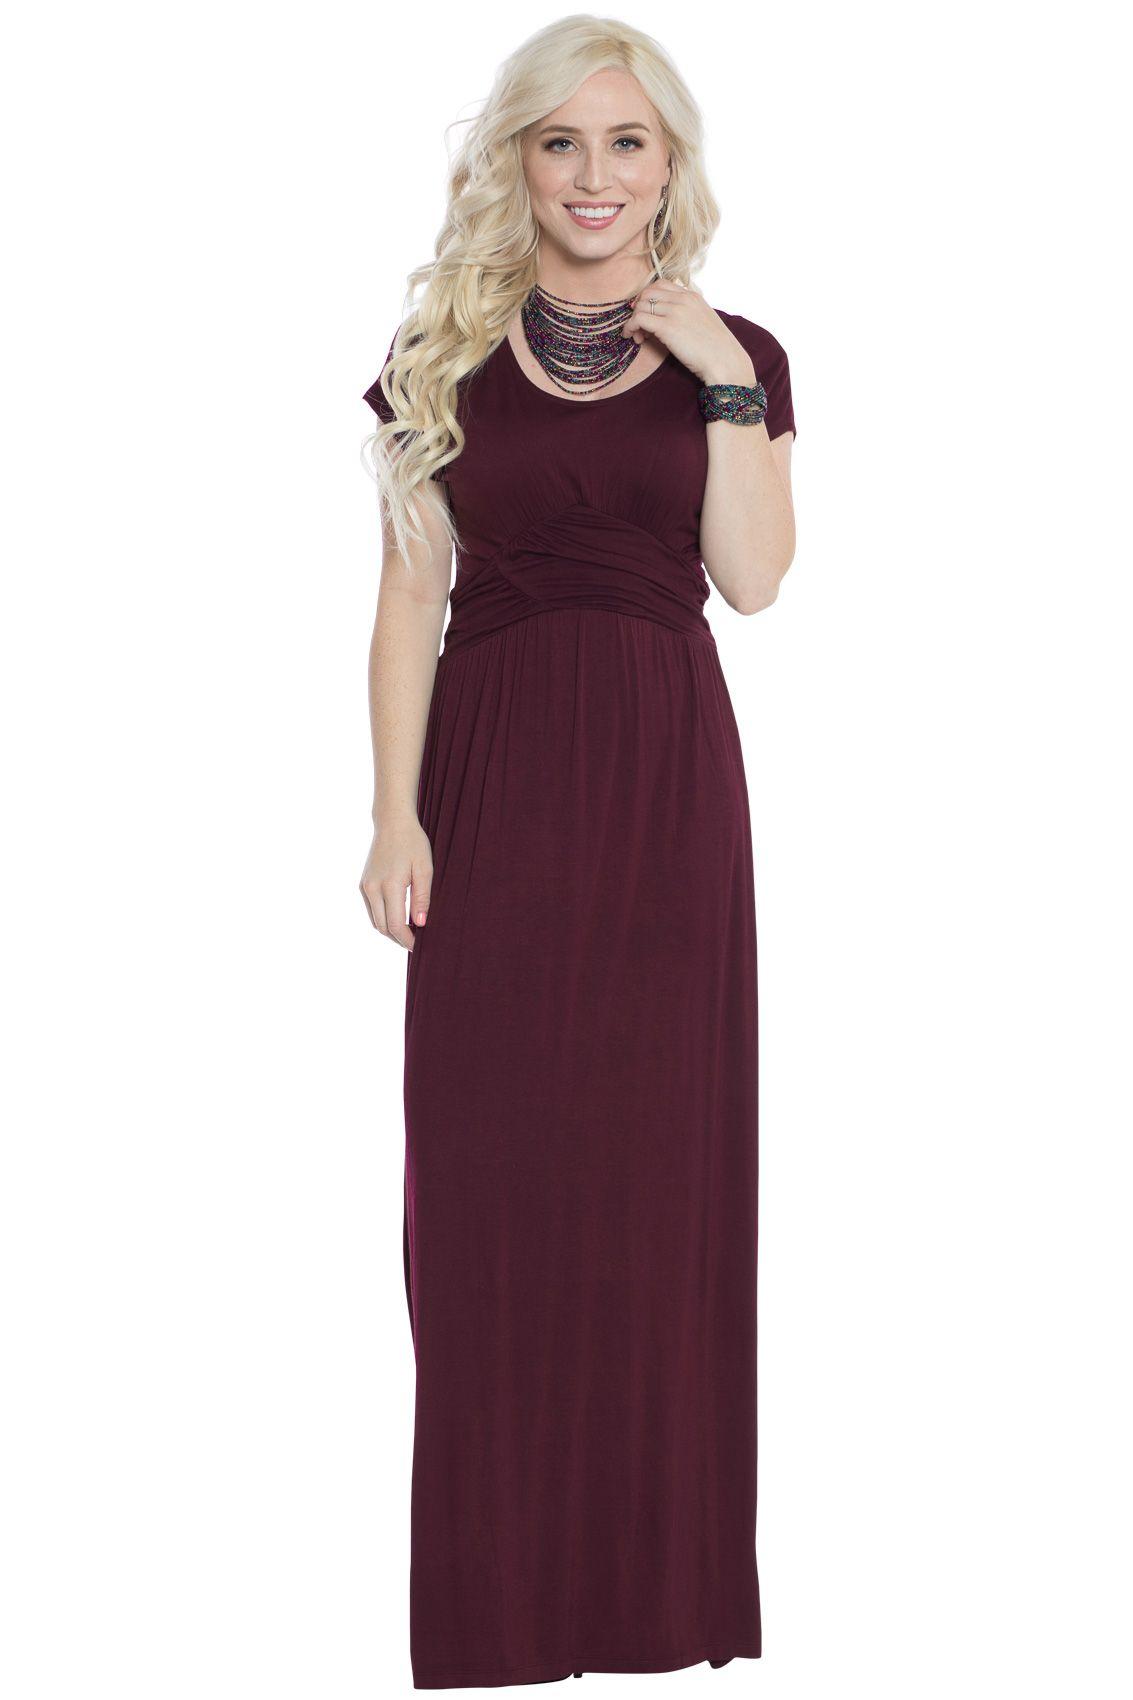 3e3c8eca105c4 Athena Modest Maxi or Bridesmaid Dress in Deep Plum Purple or Burgundy Plum